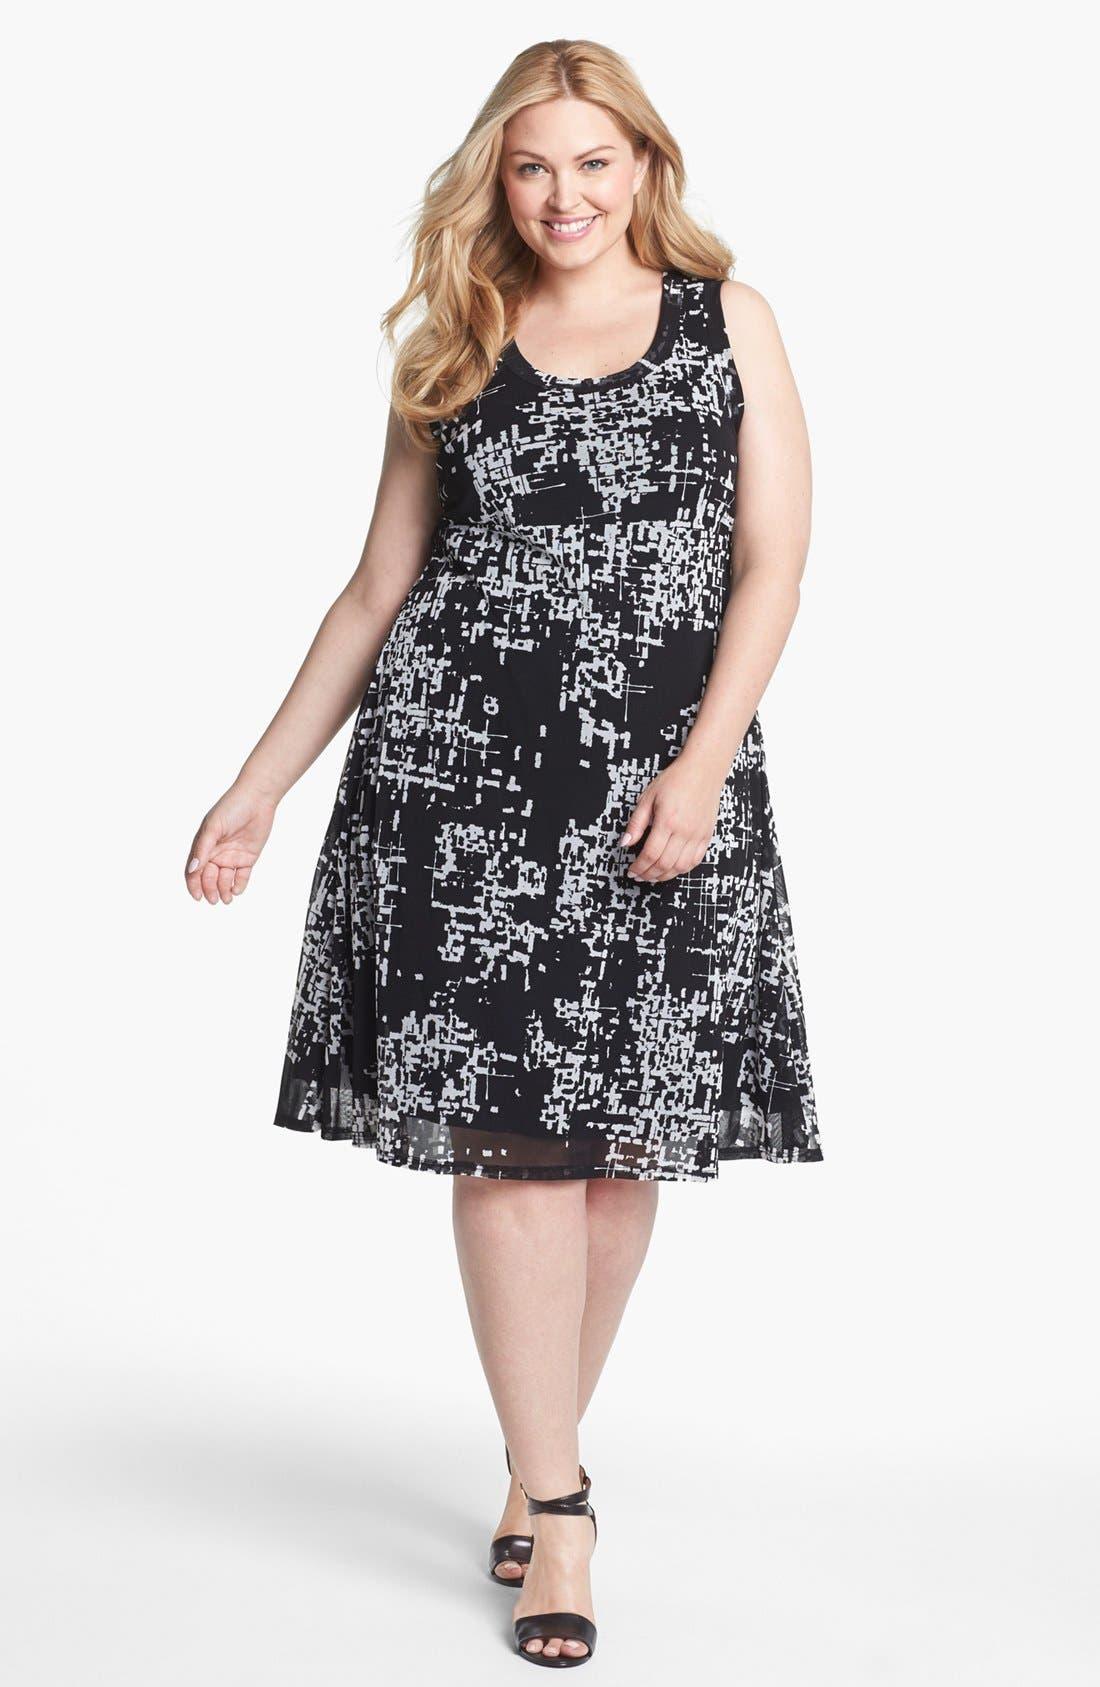 Alternate Image 1 Selected - Karen Kane Print Chiffon A-Line Dress (Plus Size)